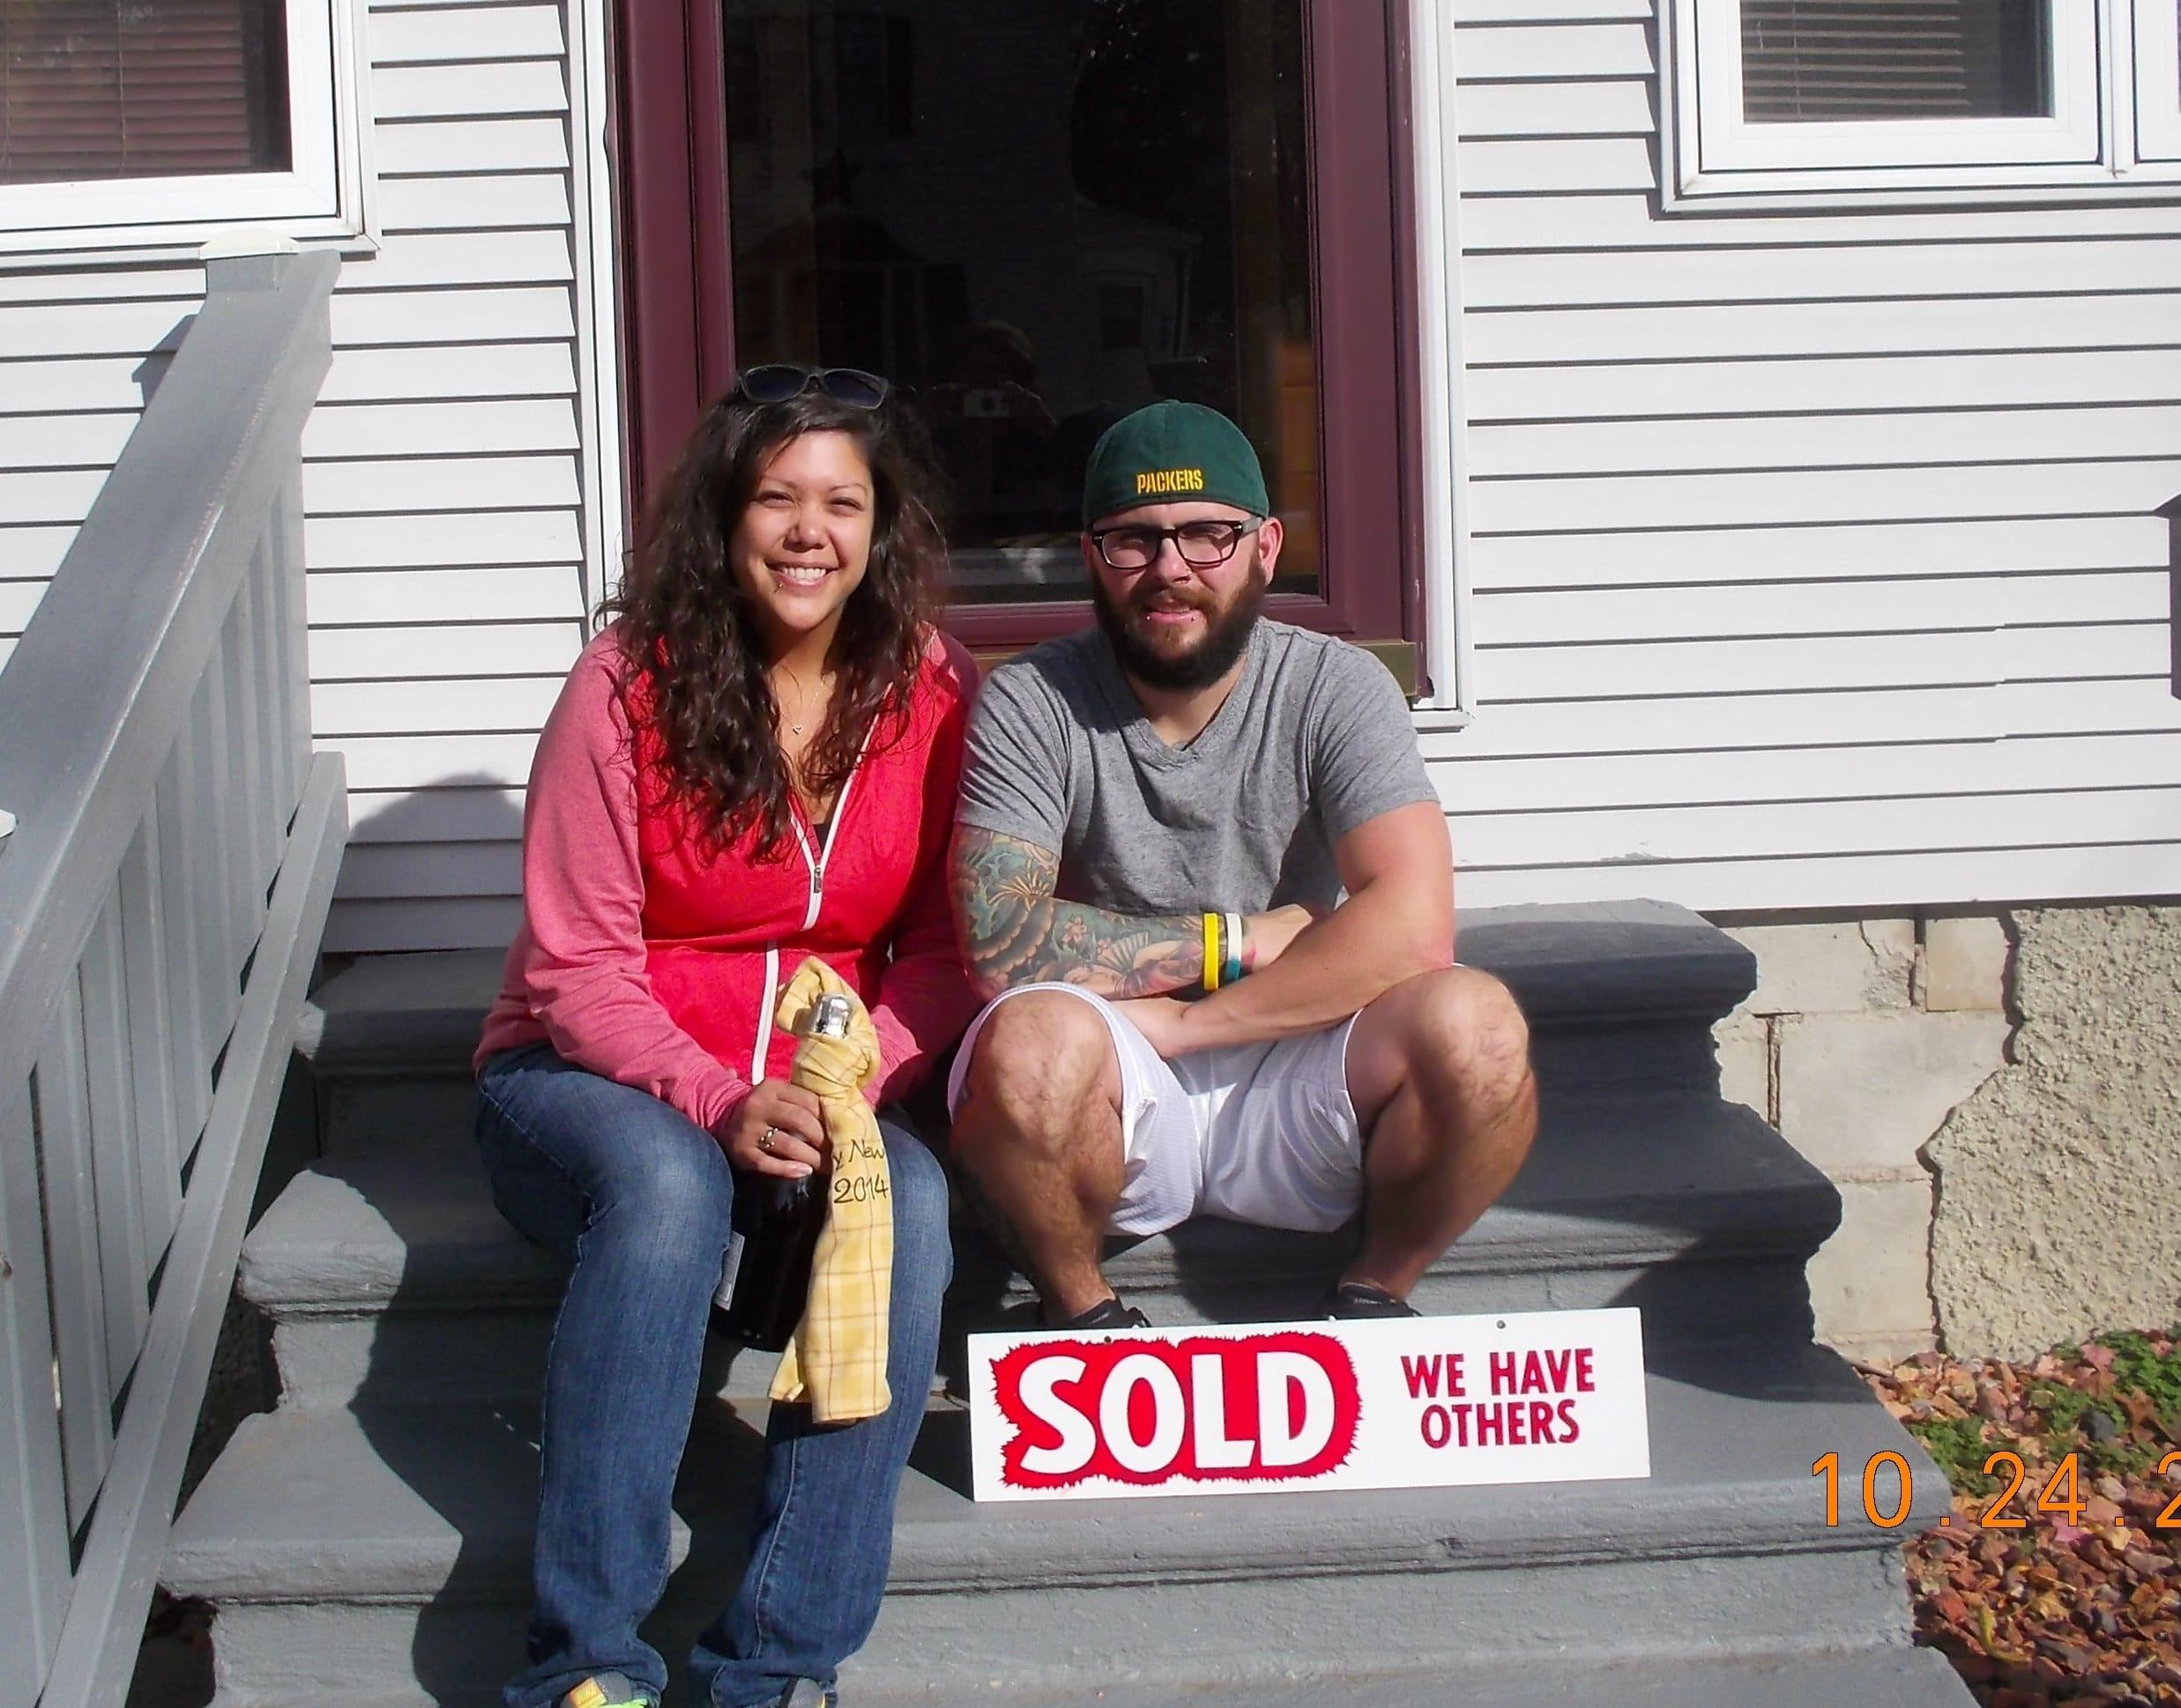 Nikki Perez and Dustin Masini